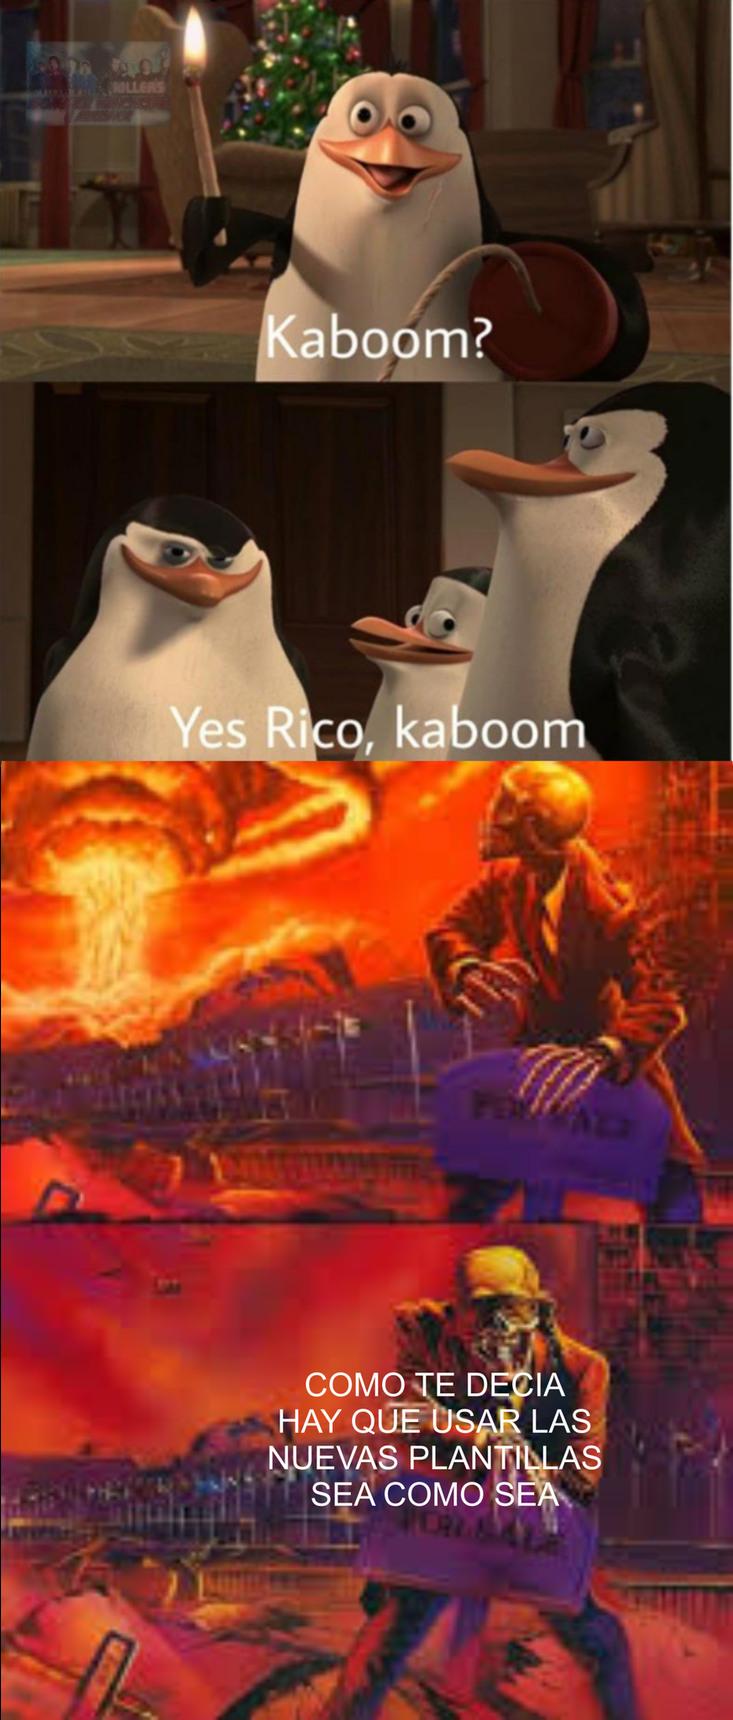 NO TENGO IDEAS - meme